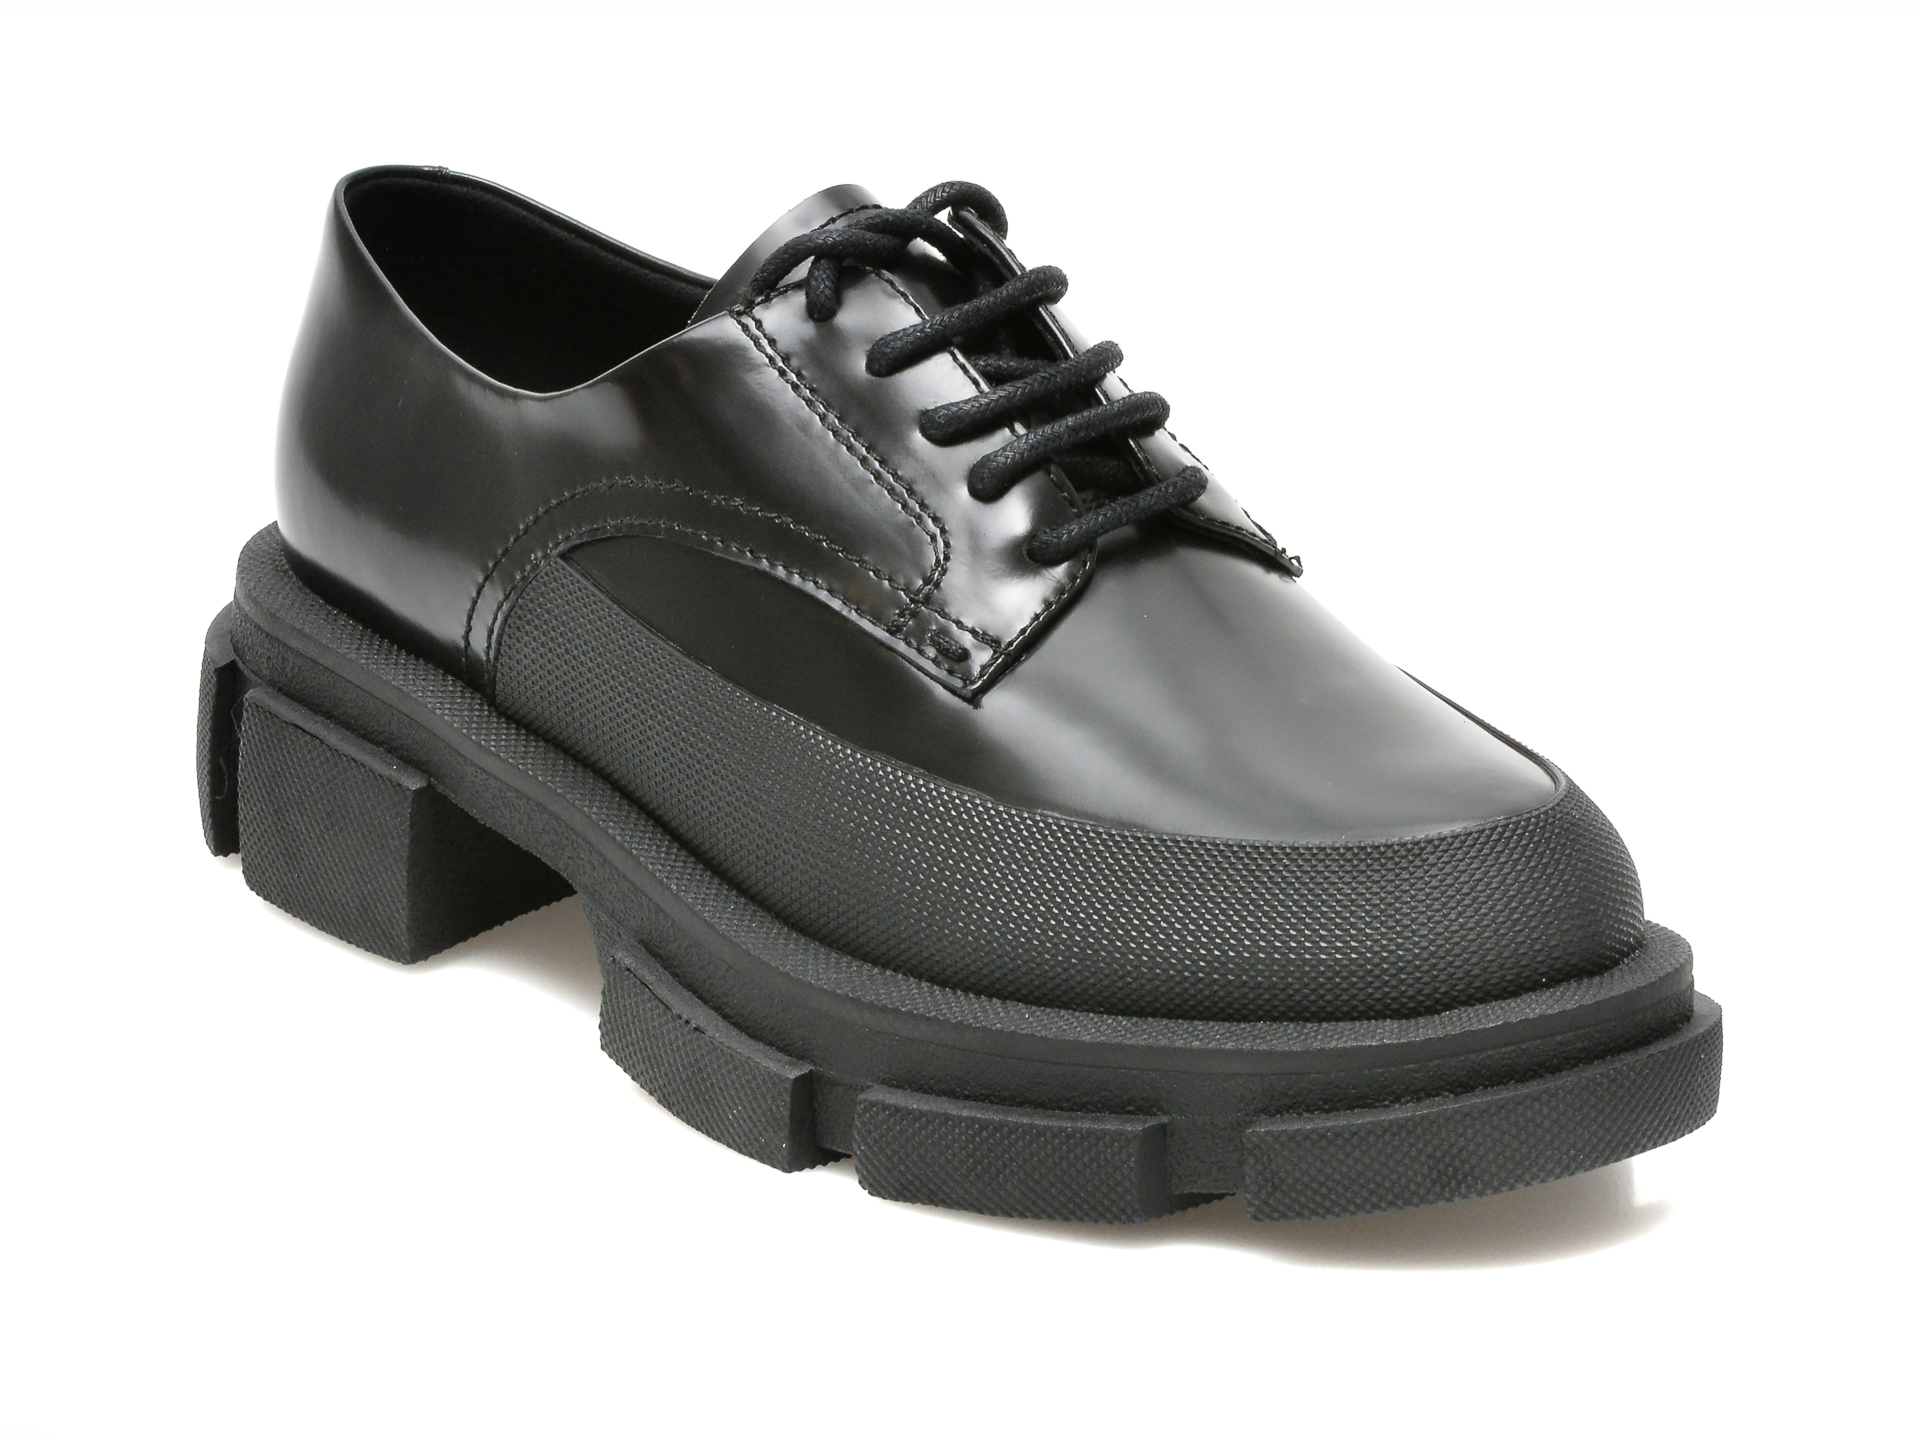 Pantofi Epica Negri, 016891e, Din Piele Naturala